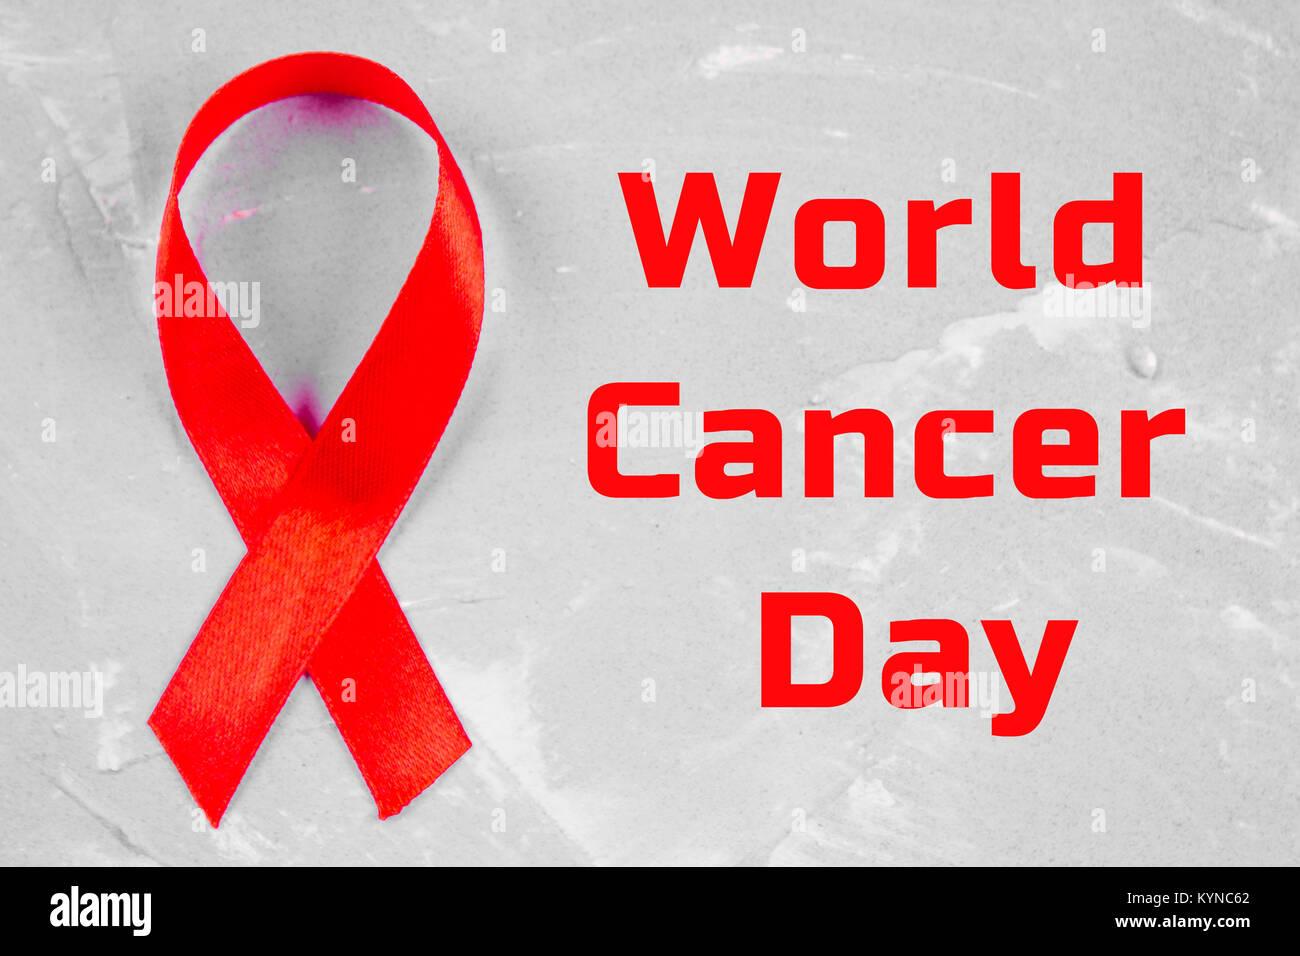 74373a665ab World Cancer Day Awareness ribbon. February 4 Stock Photo: 171959594 ...